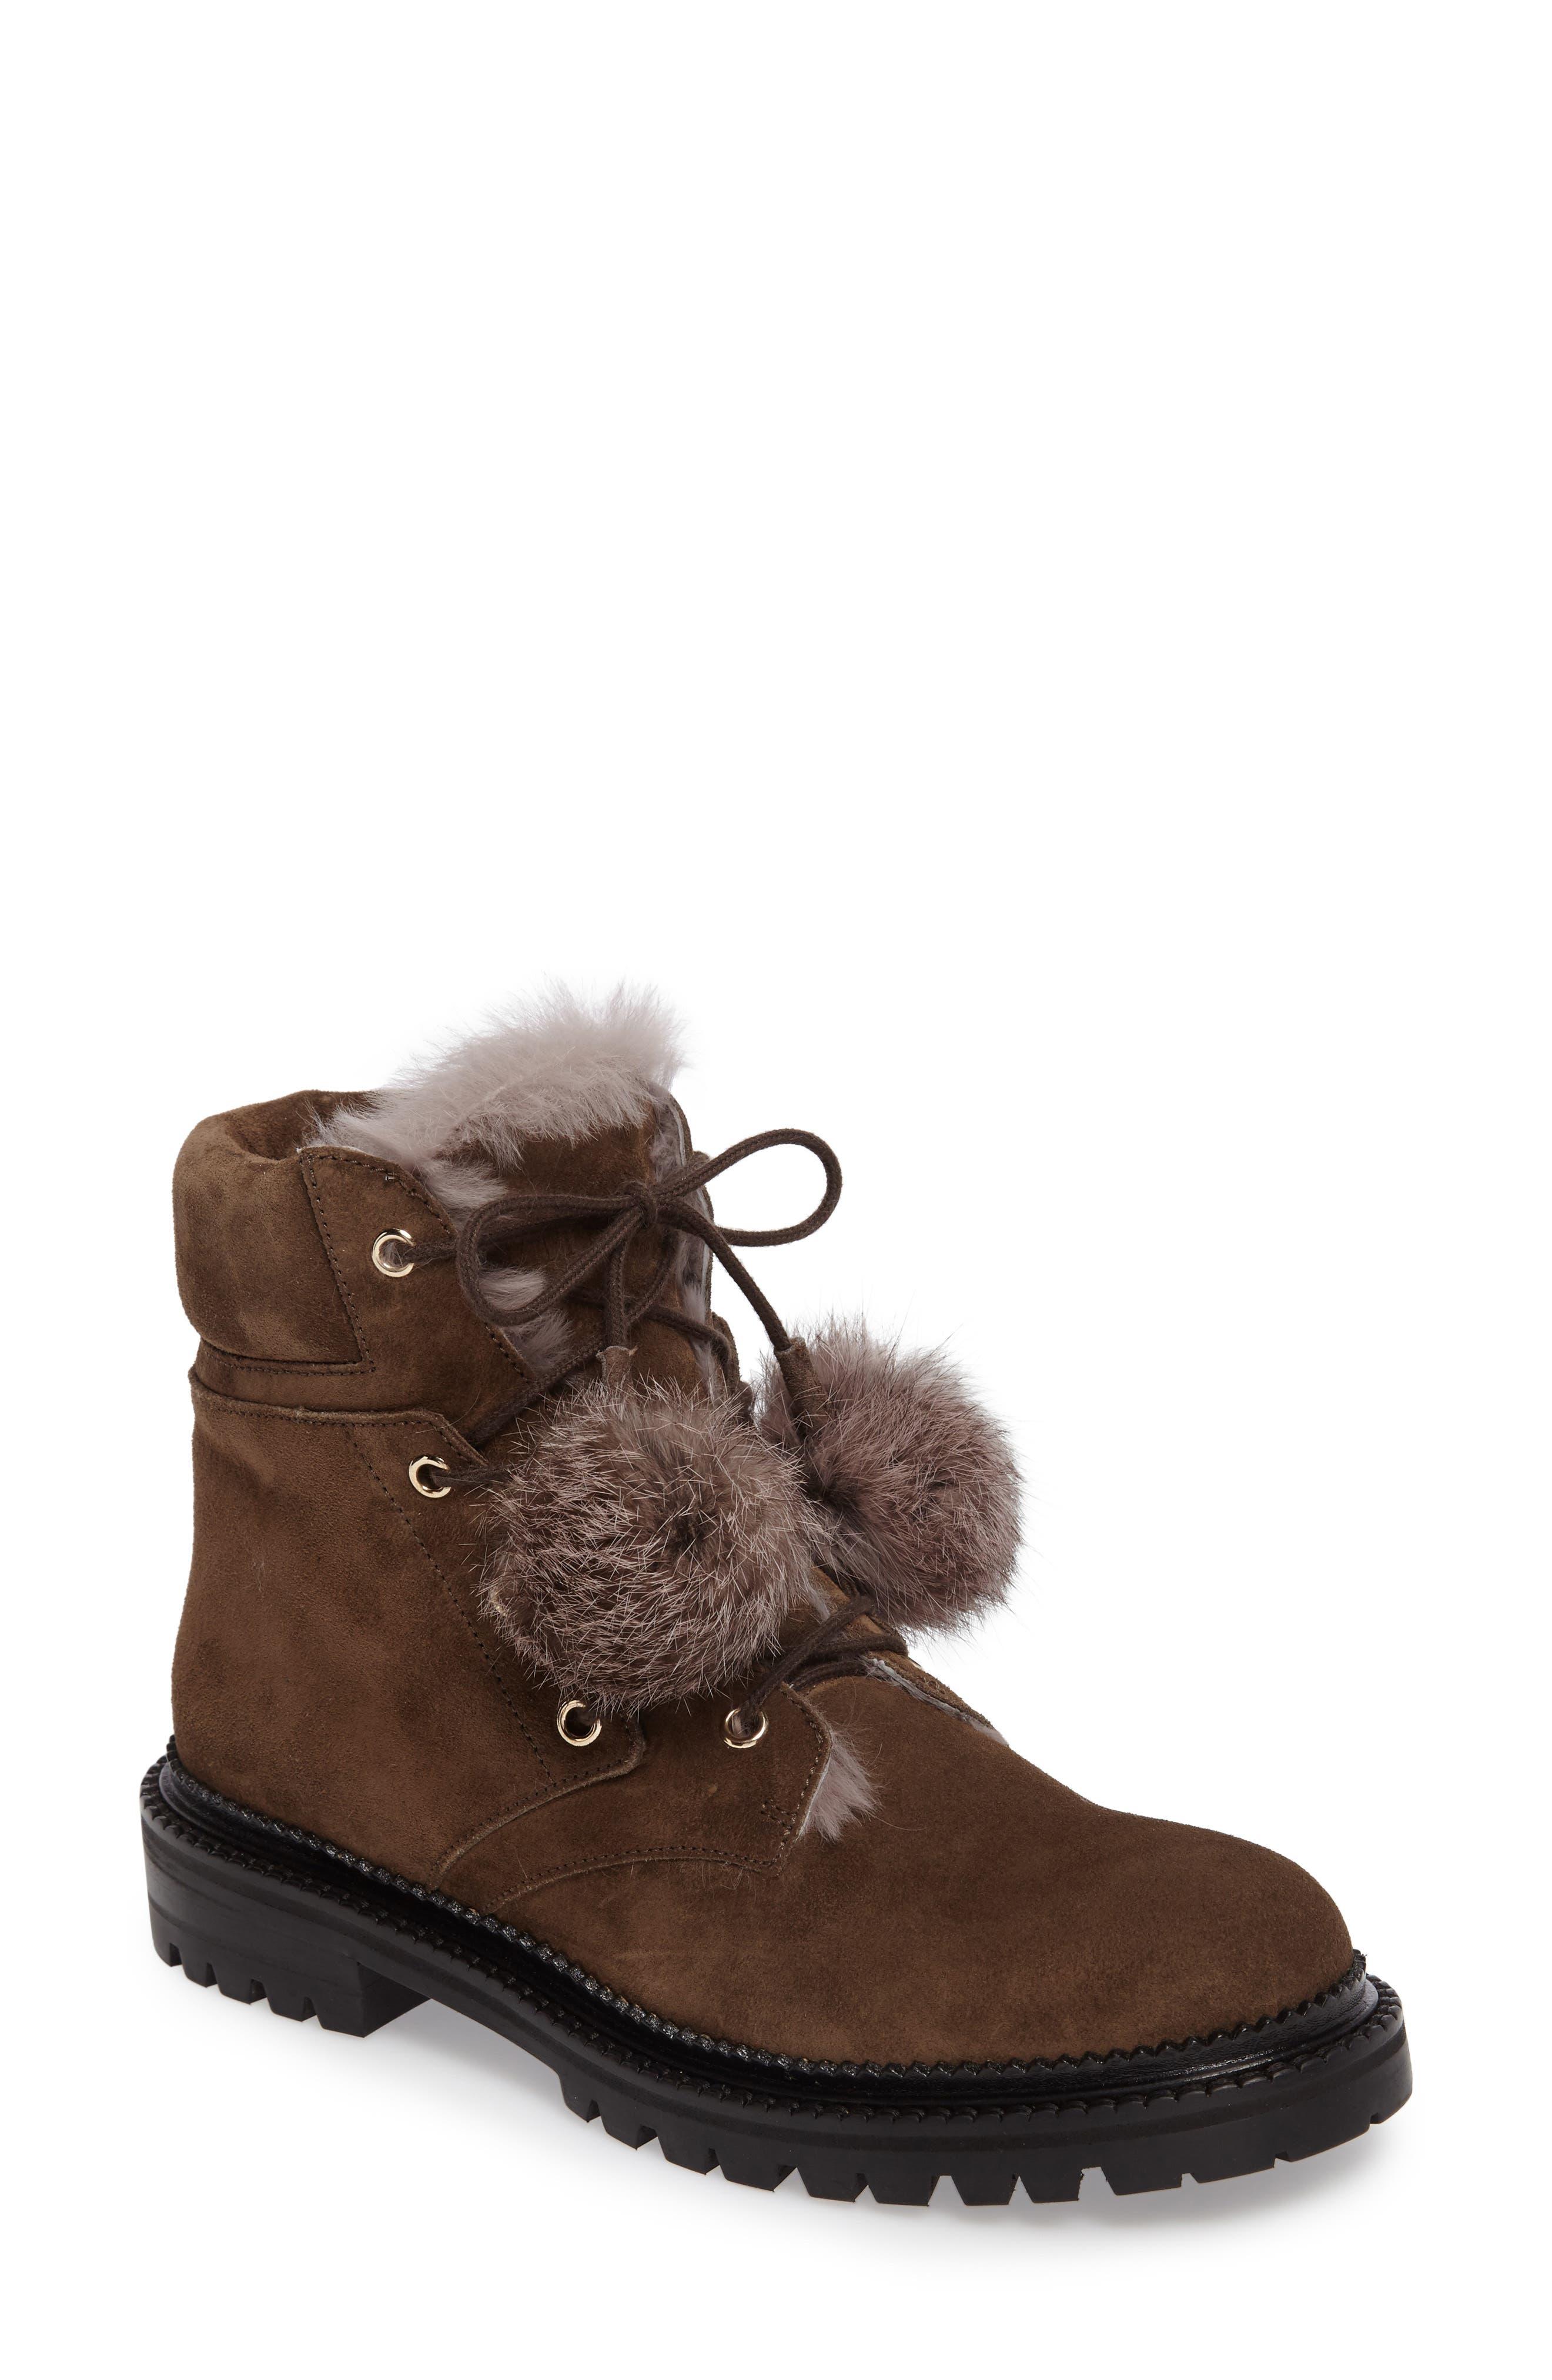 Main Image - Jimmy Choo Elba Genuine Rabbit Fur Boot (Women)